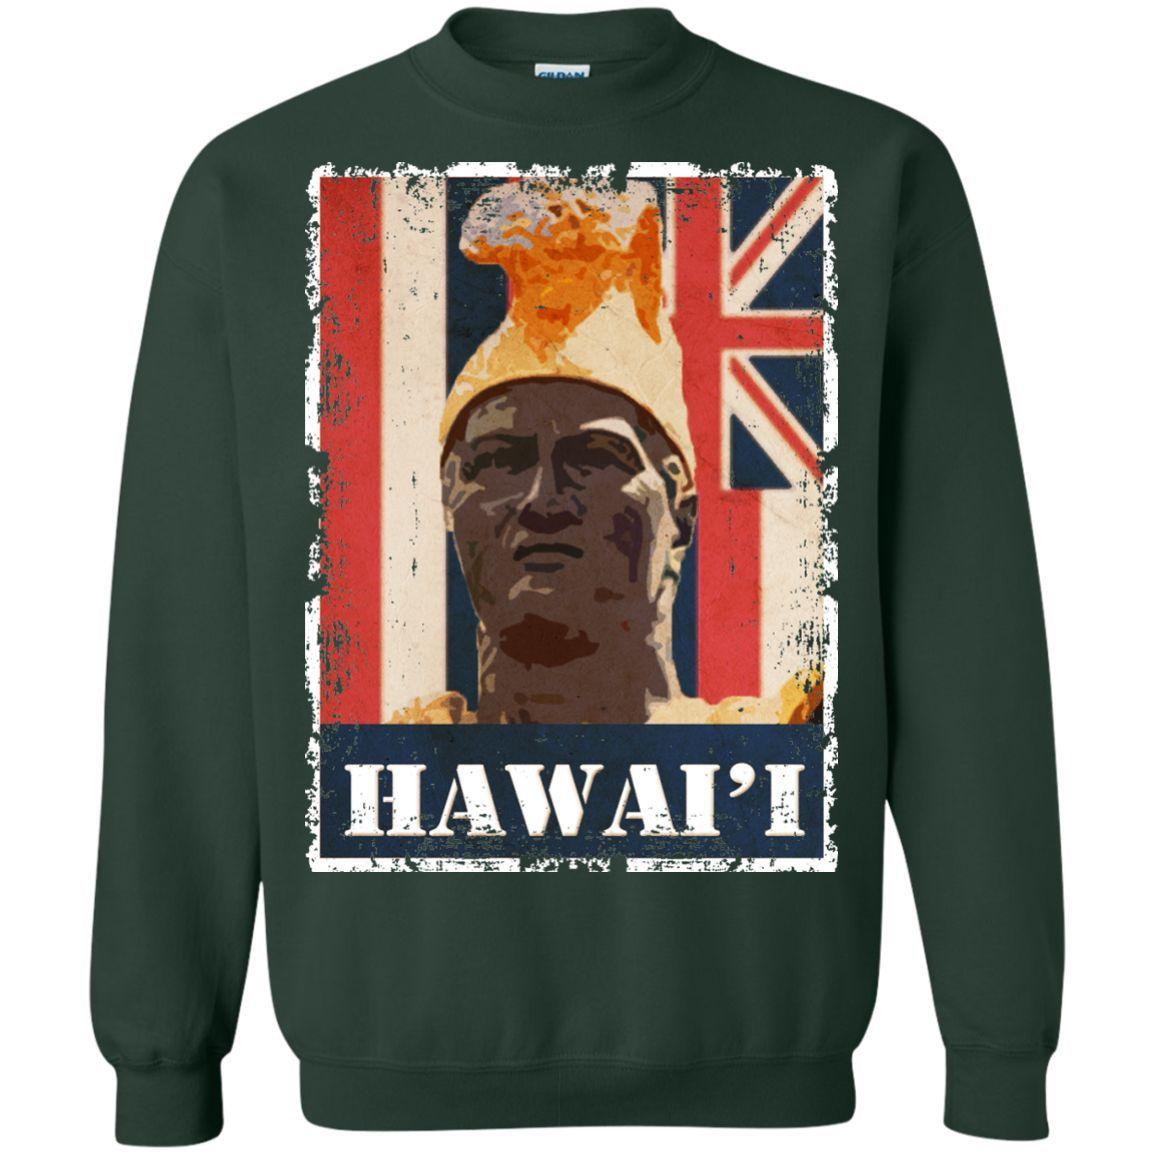 Hawai\'i King Kamehameha Printed Crewneck Pullover Sweatshirt 8 oz ...